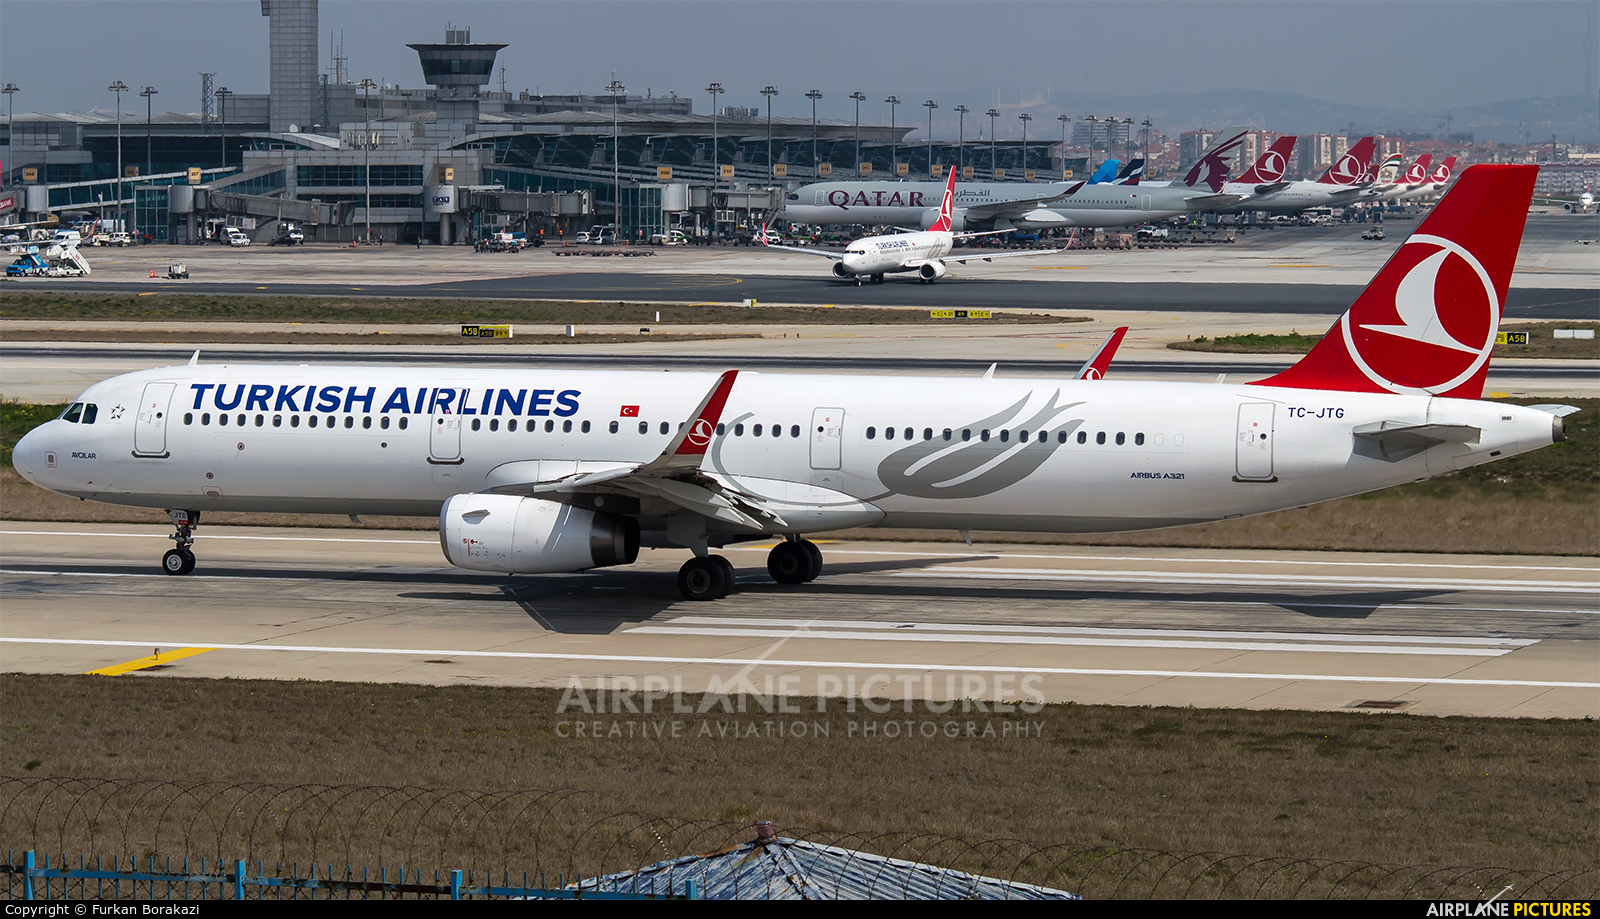 Turkish Airlines TC-JTG aircraft at Istanbul - Ataturk